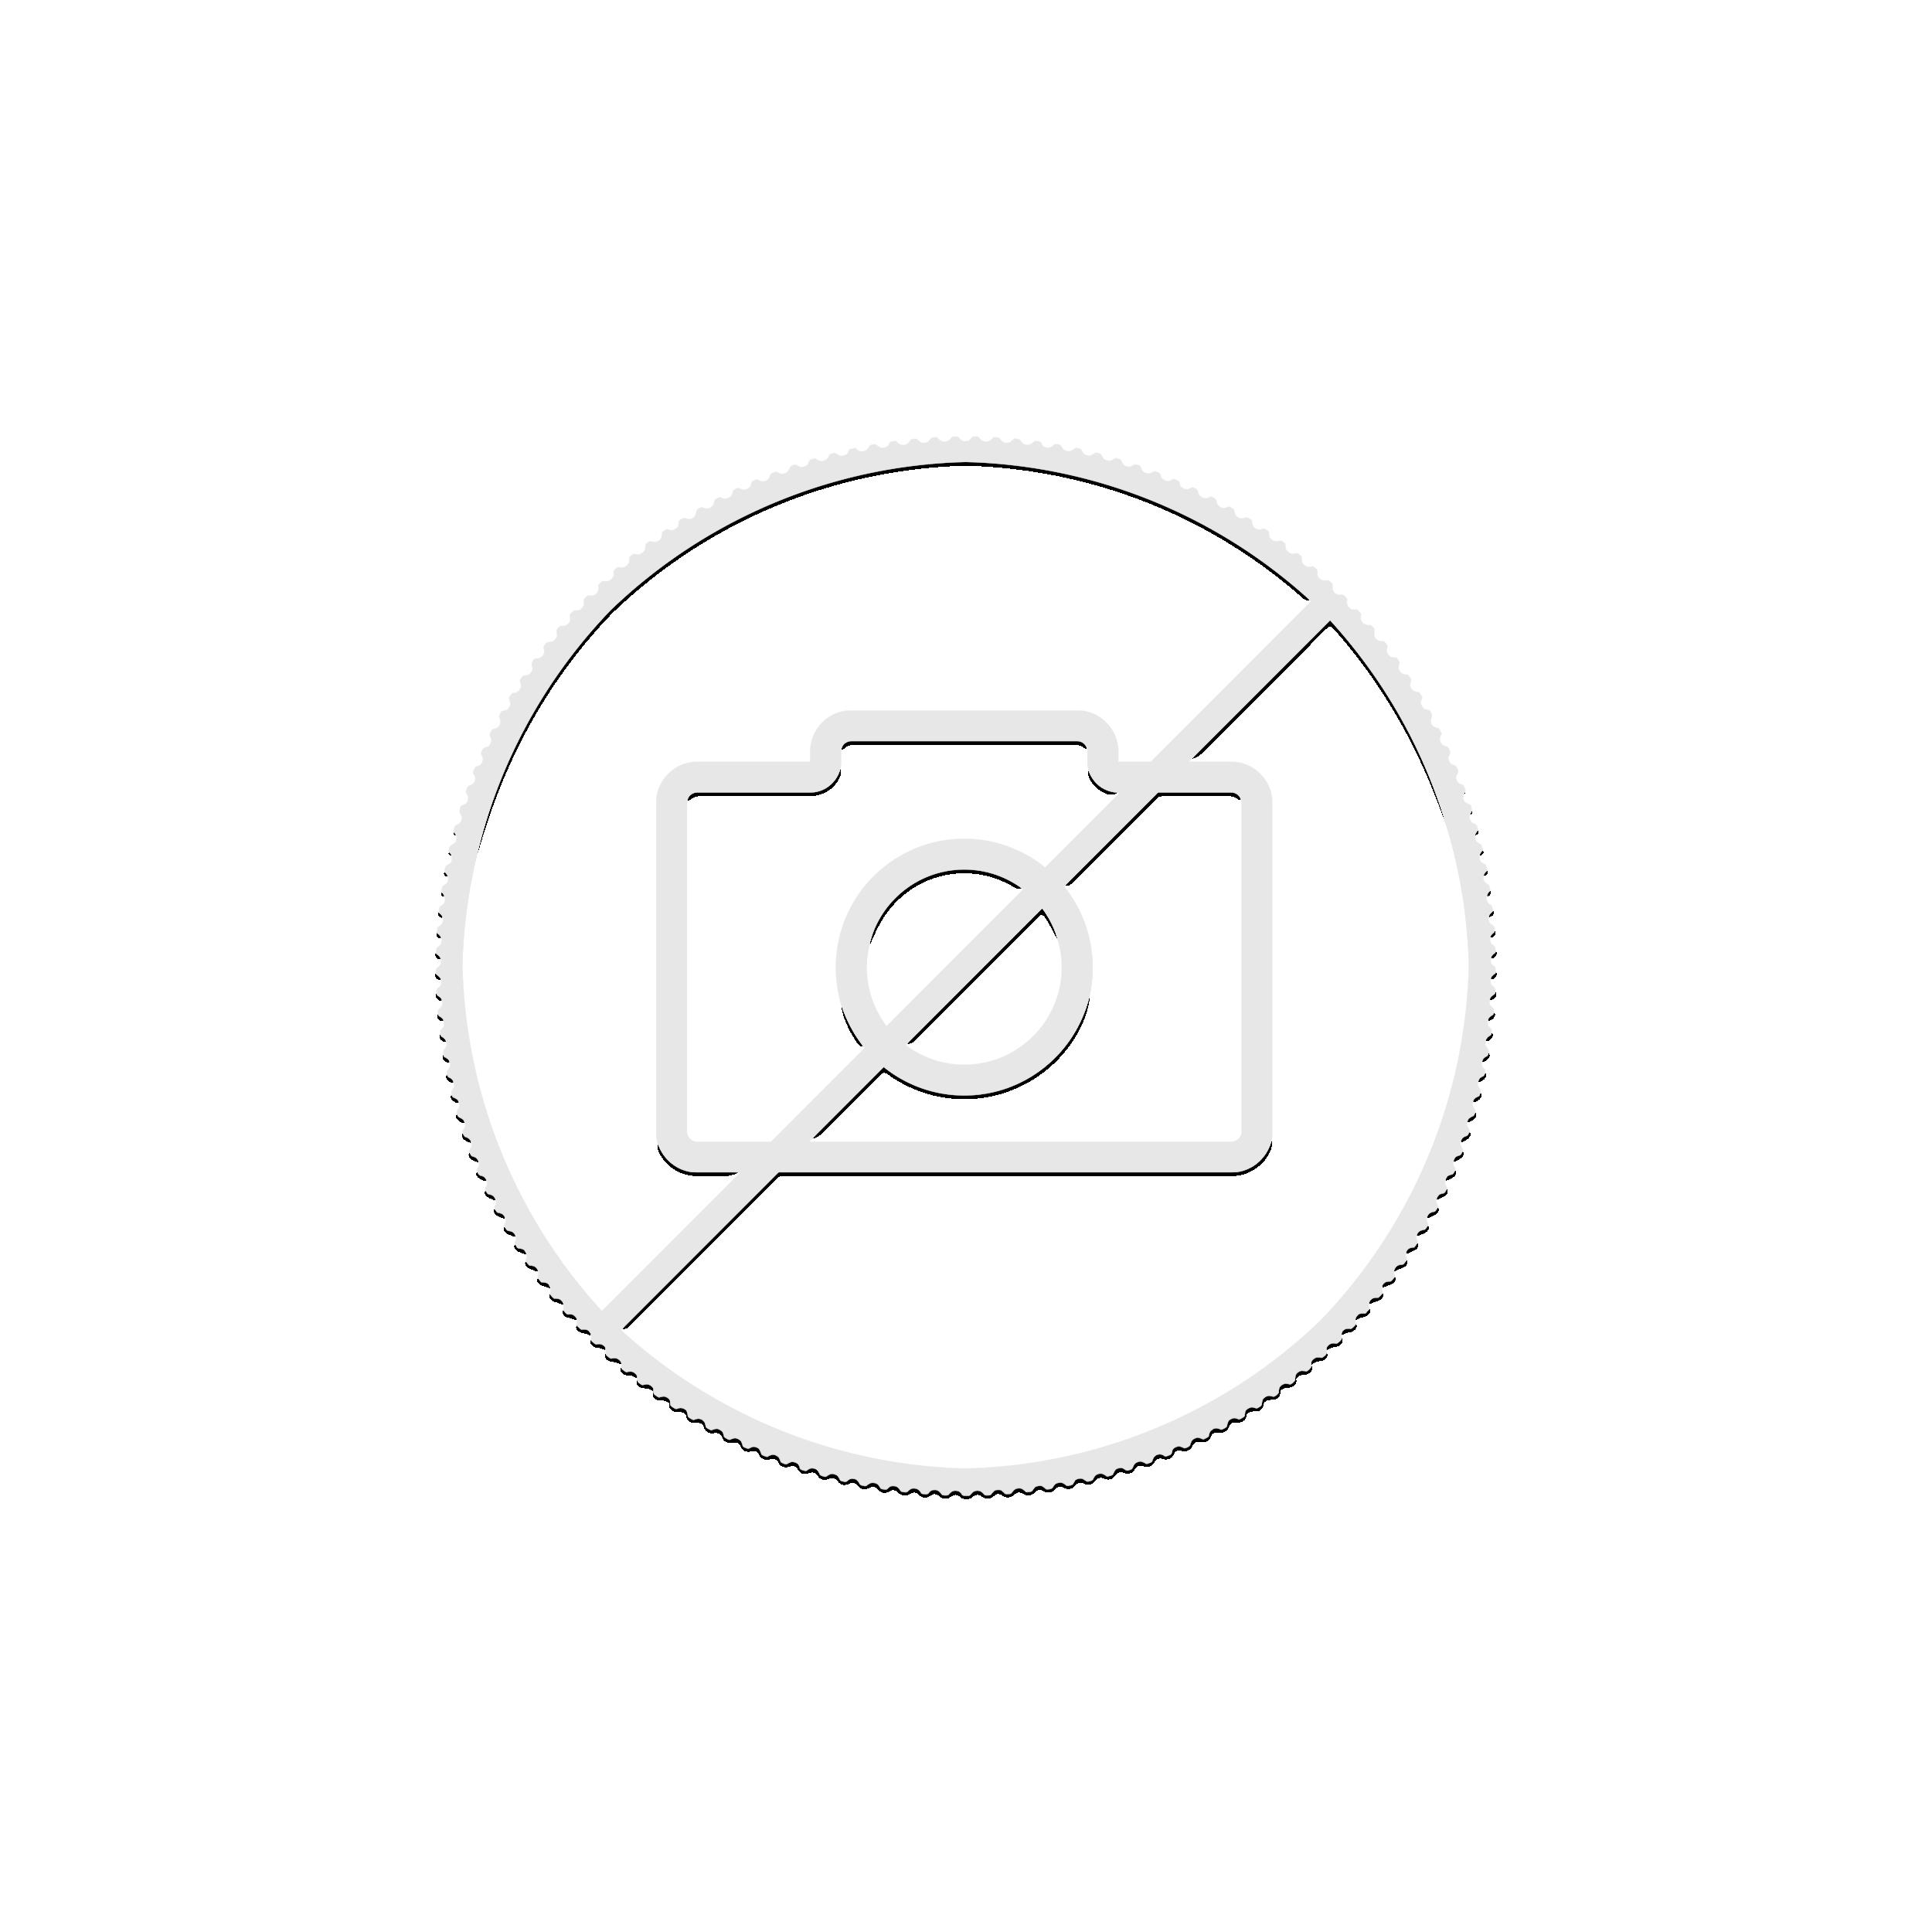 Dubbele Gouden Dukaat Gouden Munt